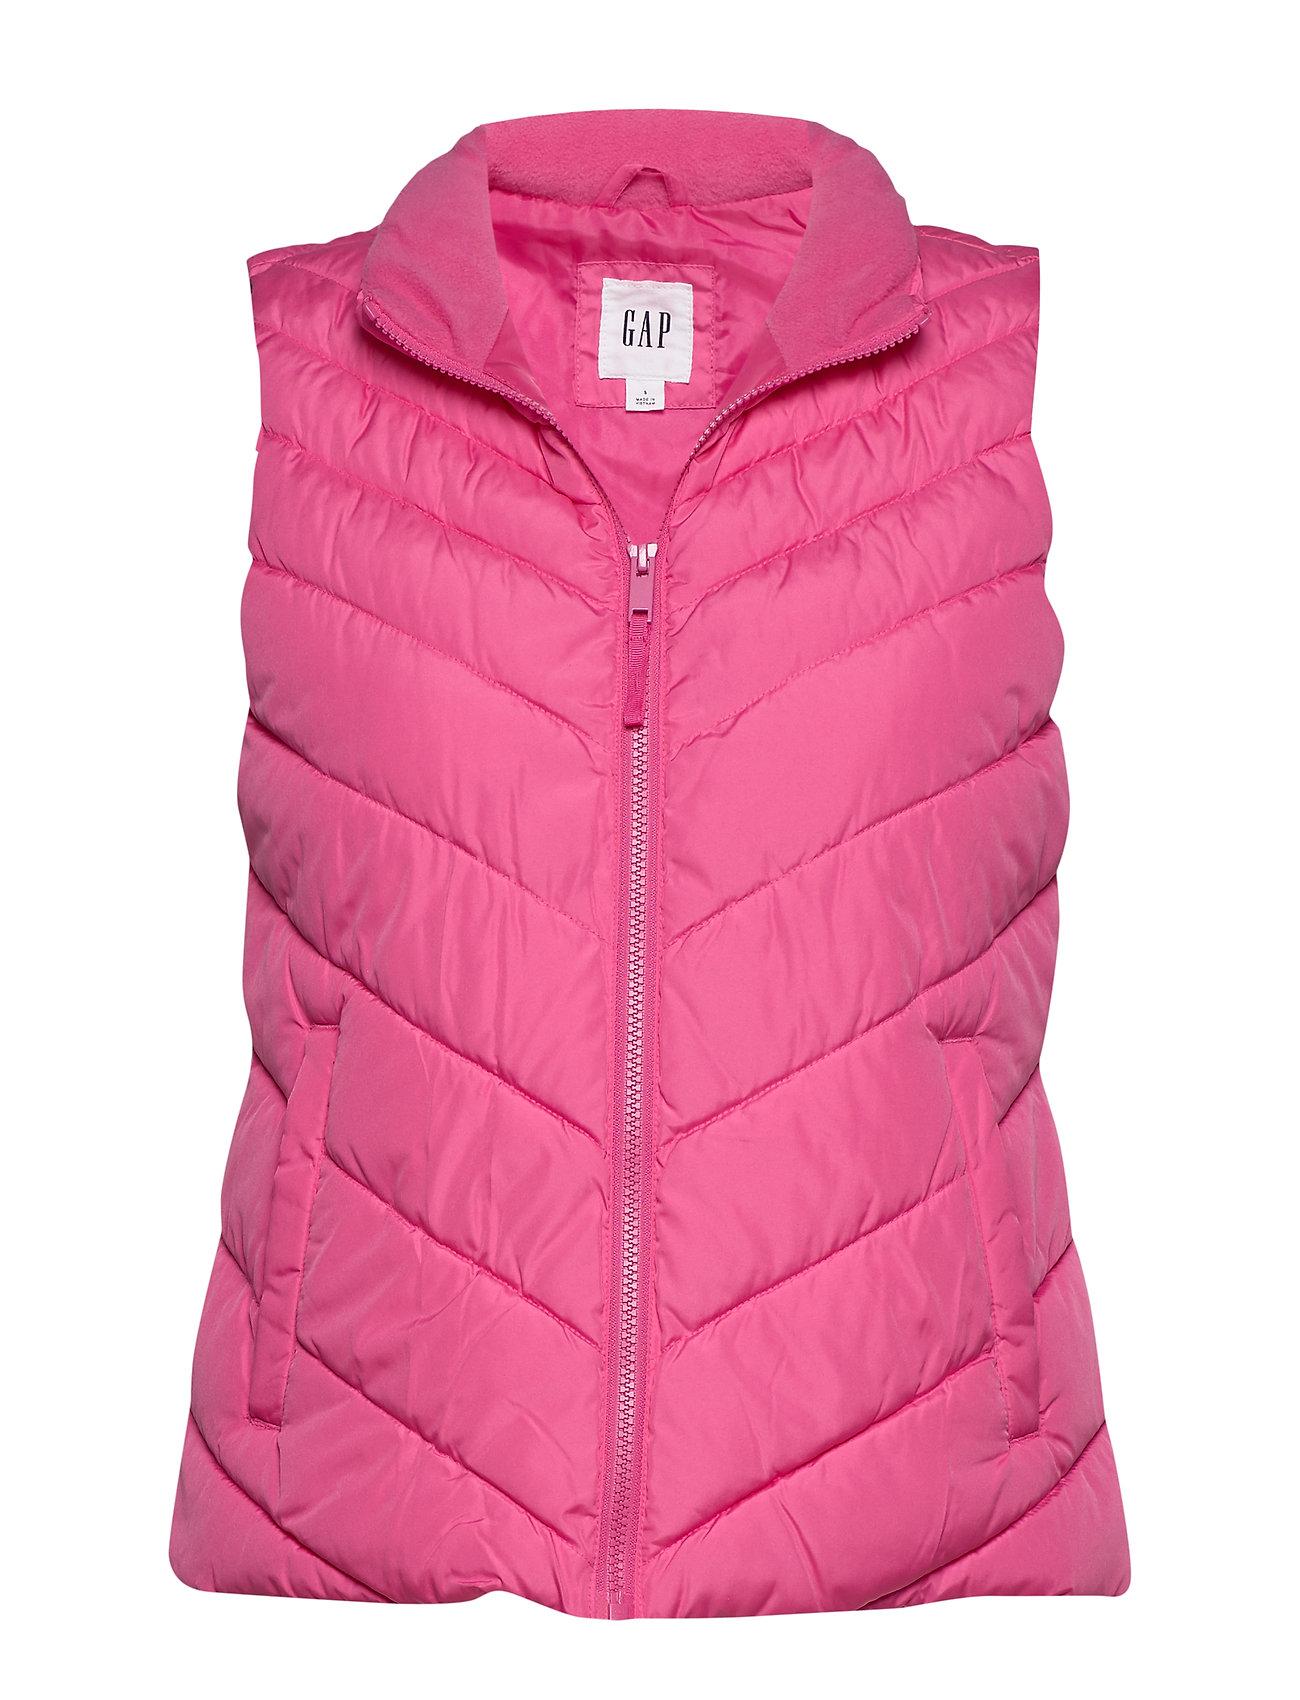 V warmest Puffer Vestbold PinkGap 0Ok8wPXn